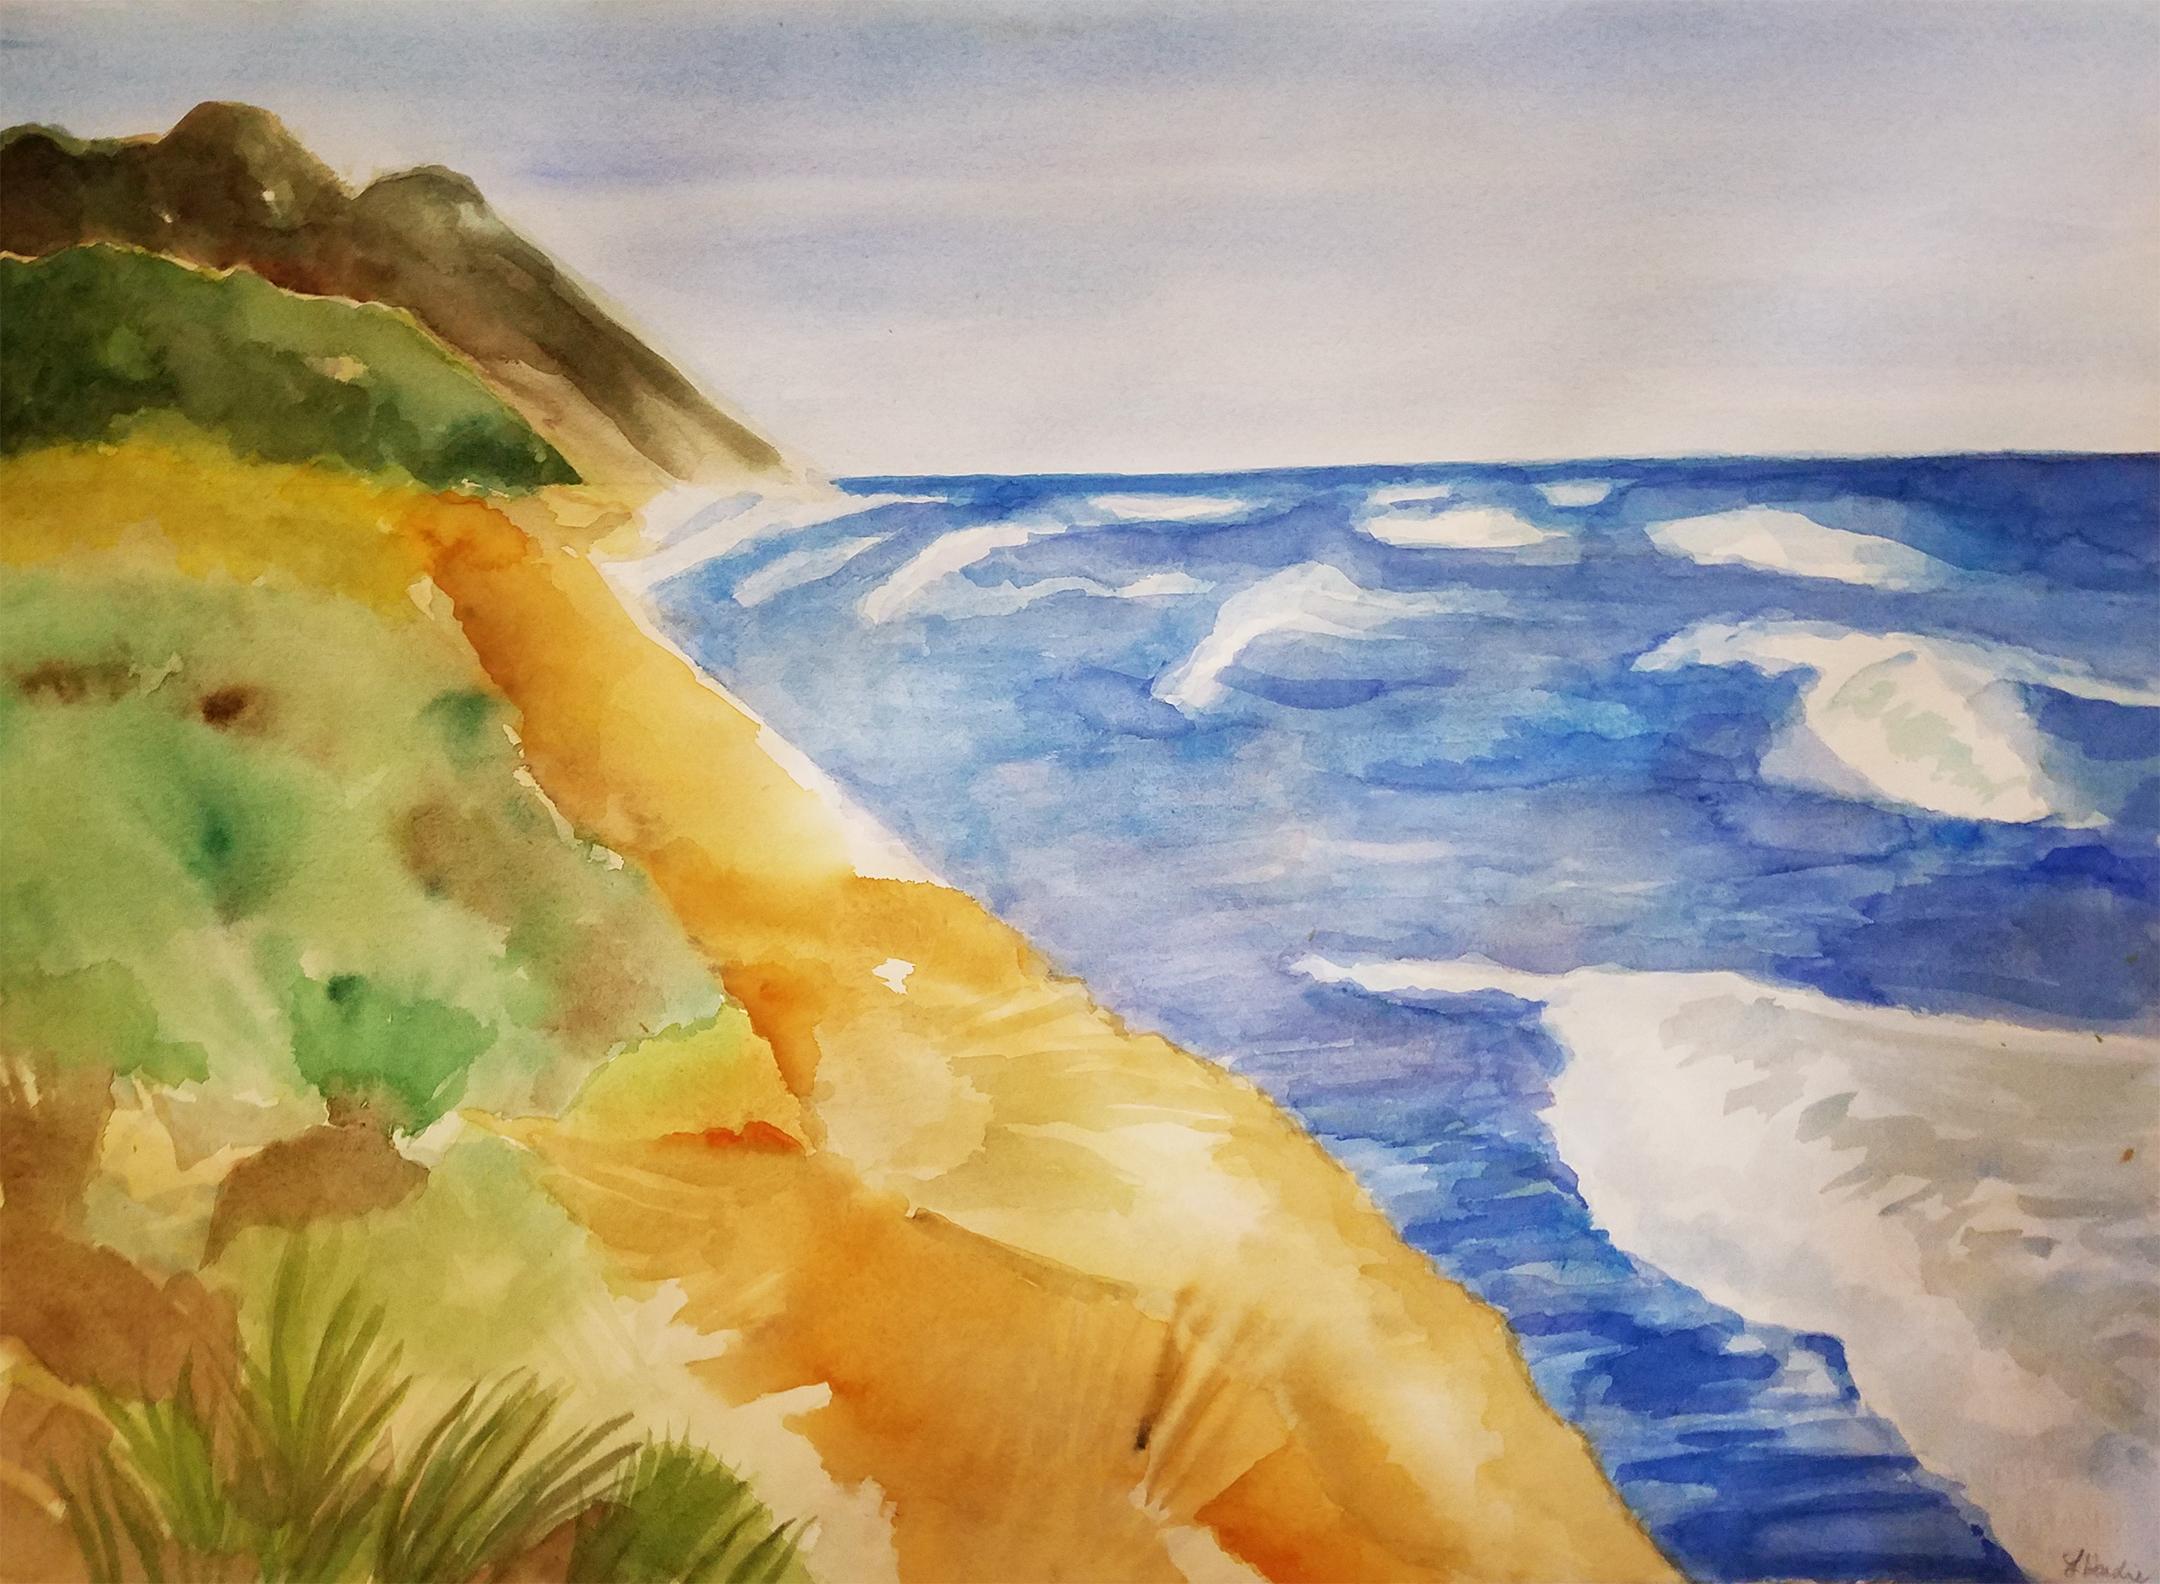 "Leslie Hardie, Sleeping Bear Dunes, Lake Michigan, Watercolor on Arches paper, 22""x30"", $800"